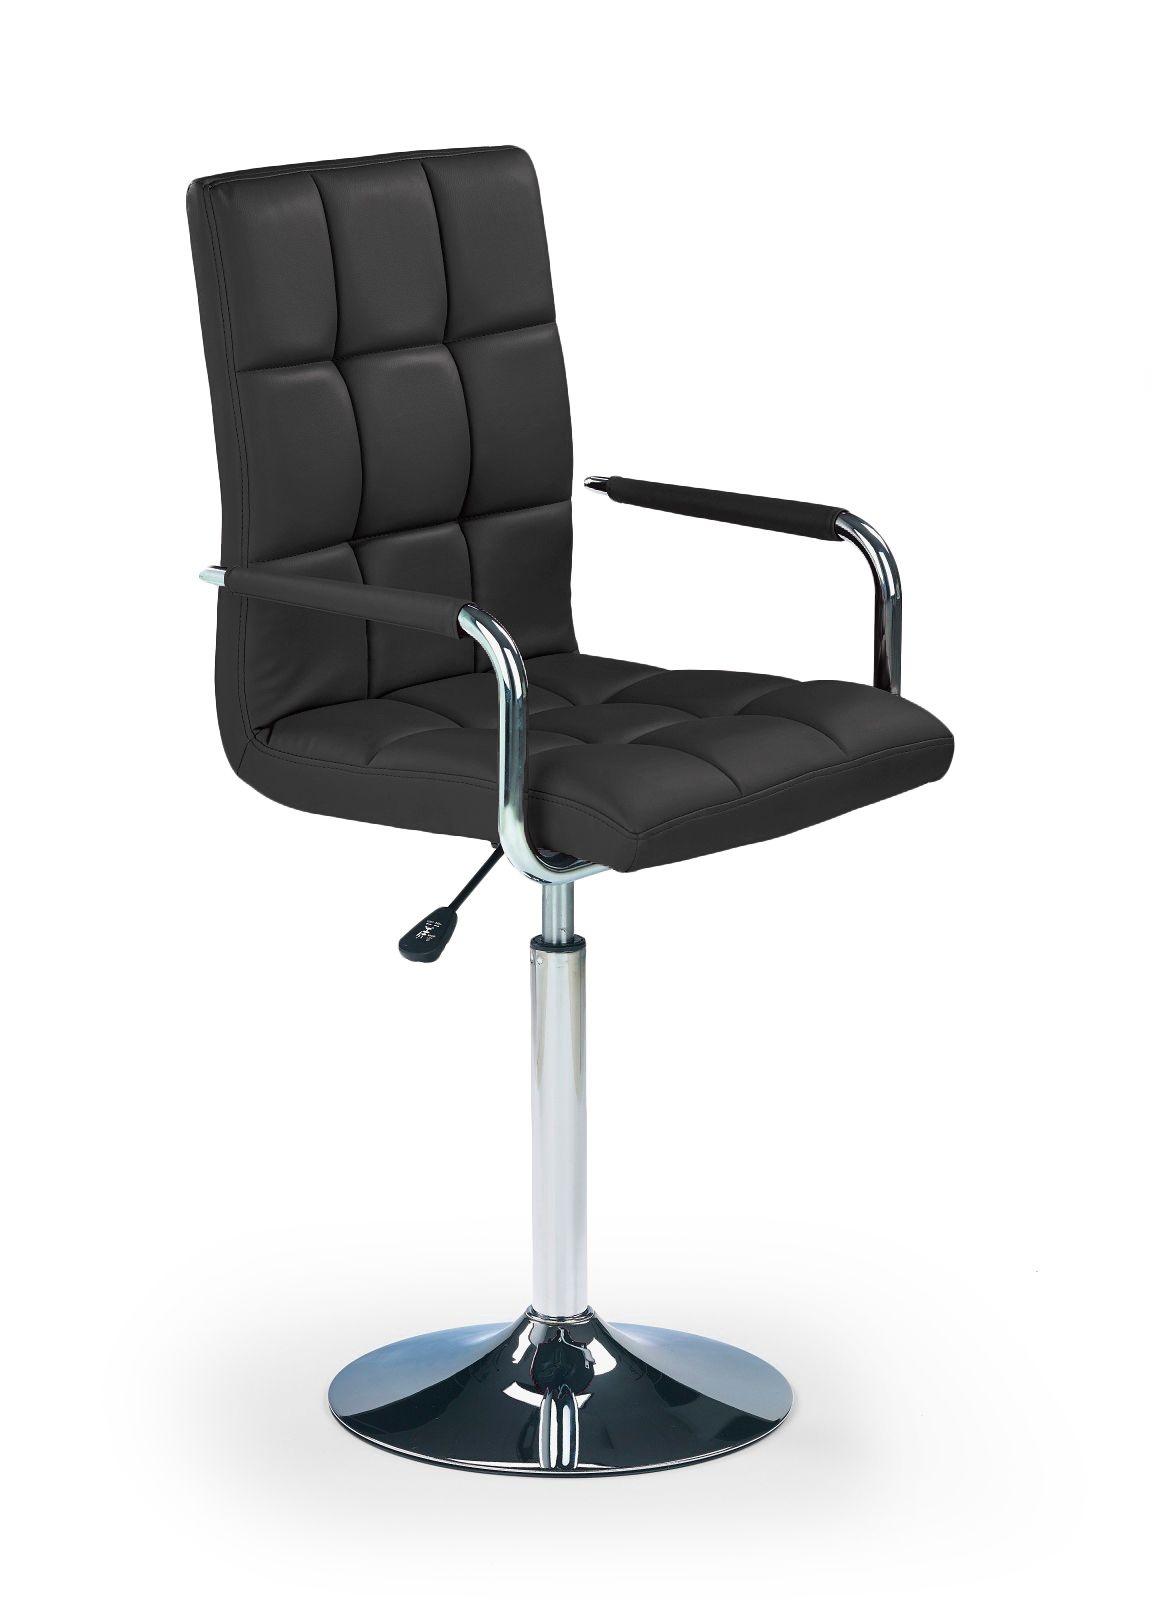 Barová židle - Halmar - Gonzo černá